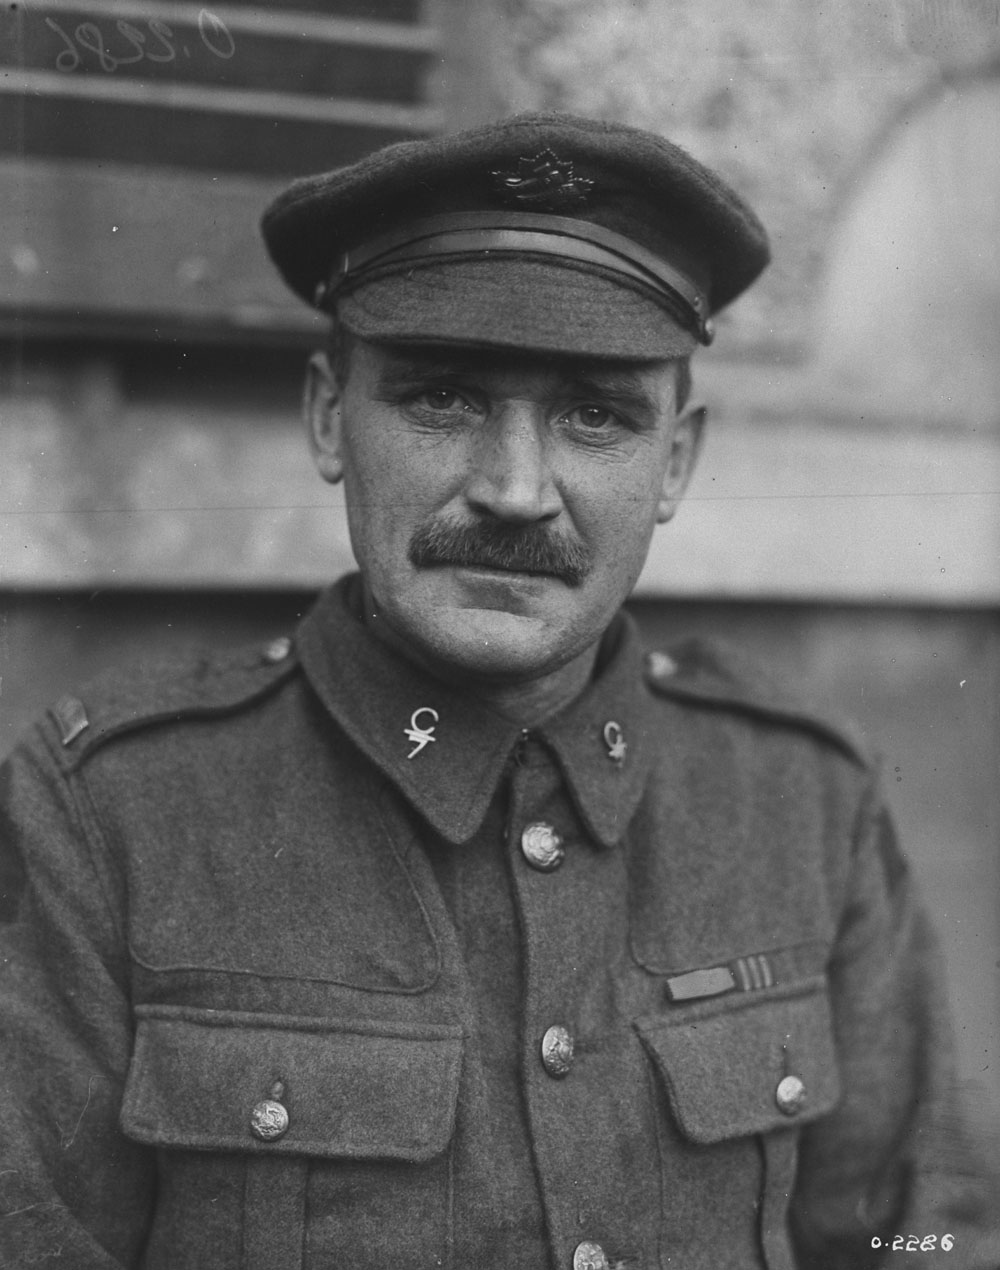 Michael O'Rourke